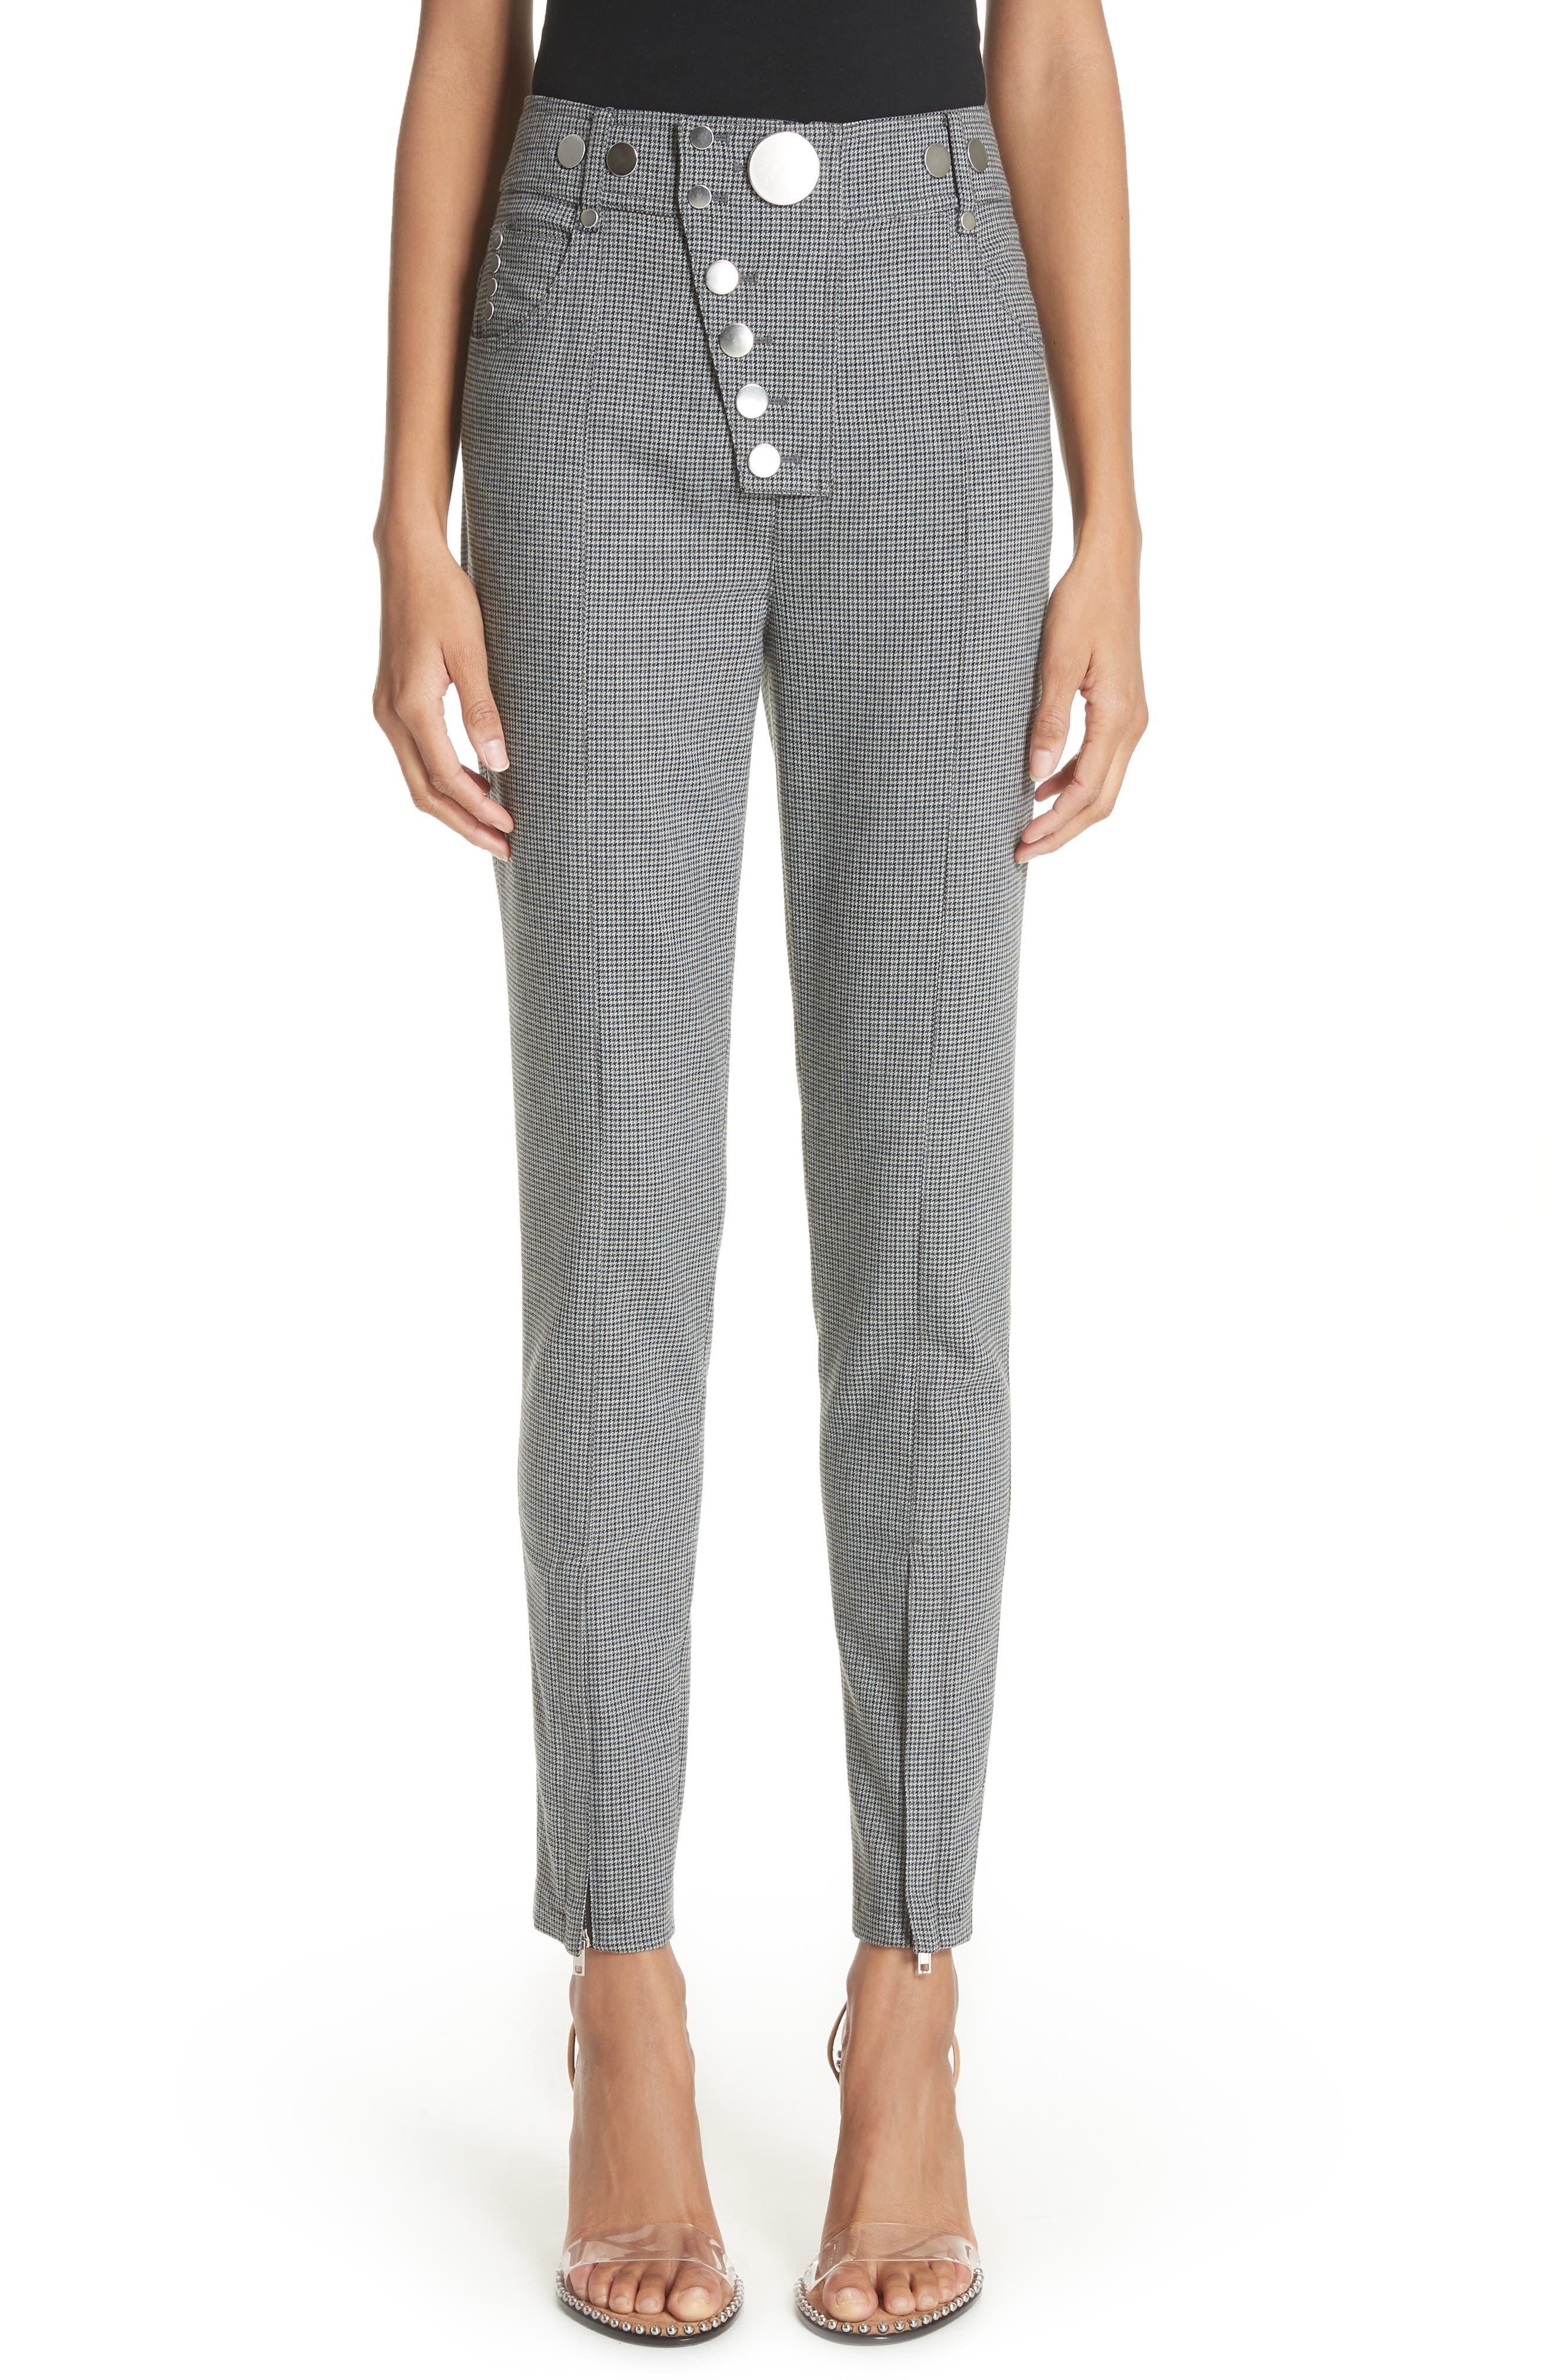 ALEXANDER WANG Skinny Plaid Pants, Main, color, 020